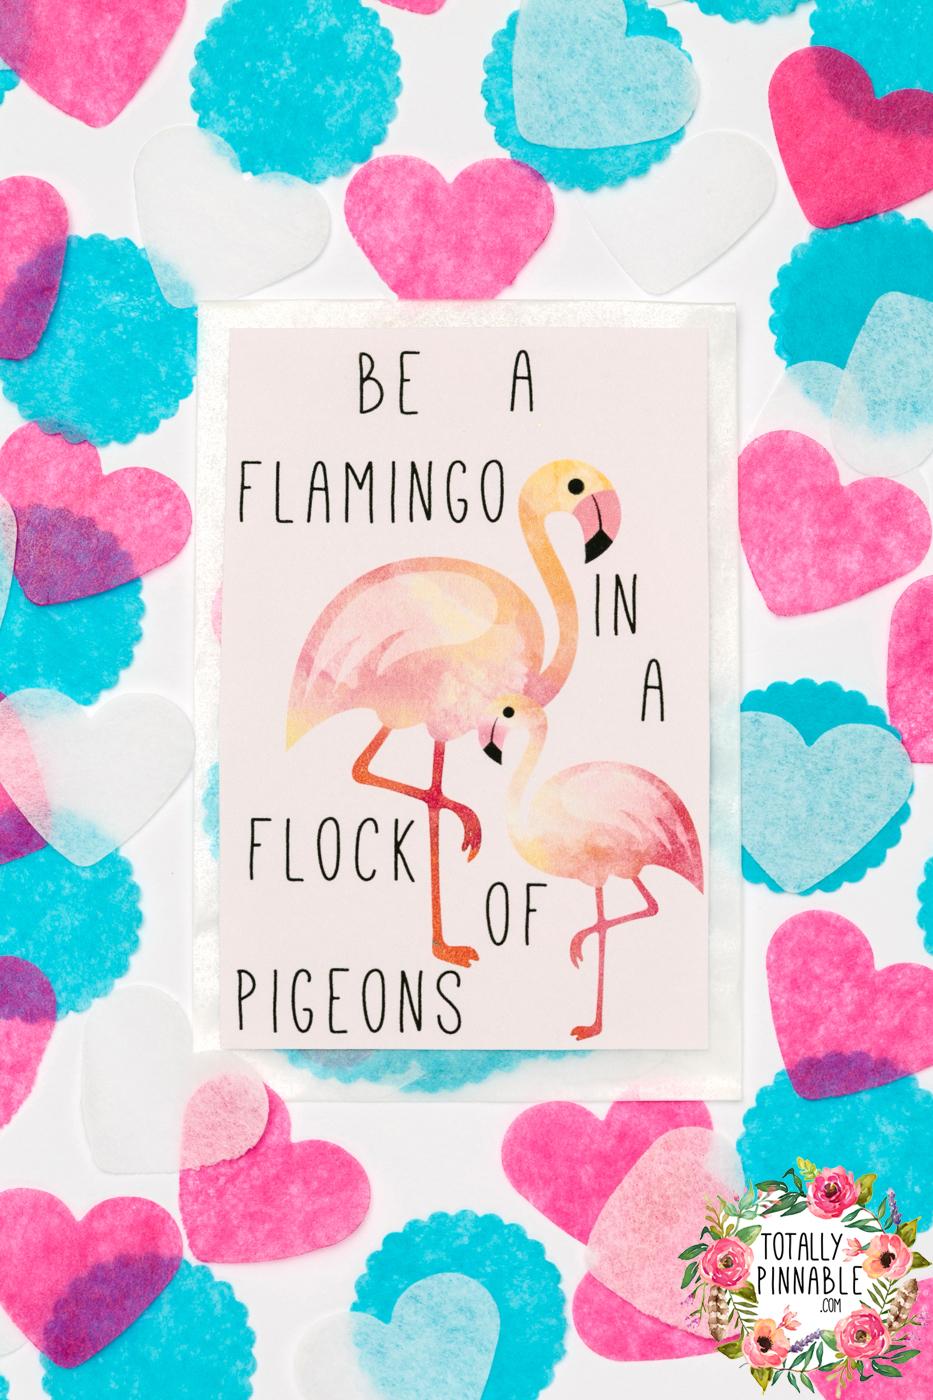 flamingo confetti glassine envelope by totallypinnable.com